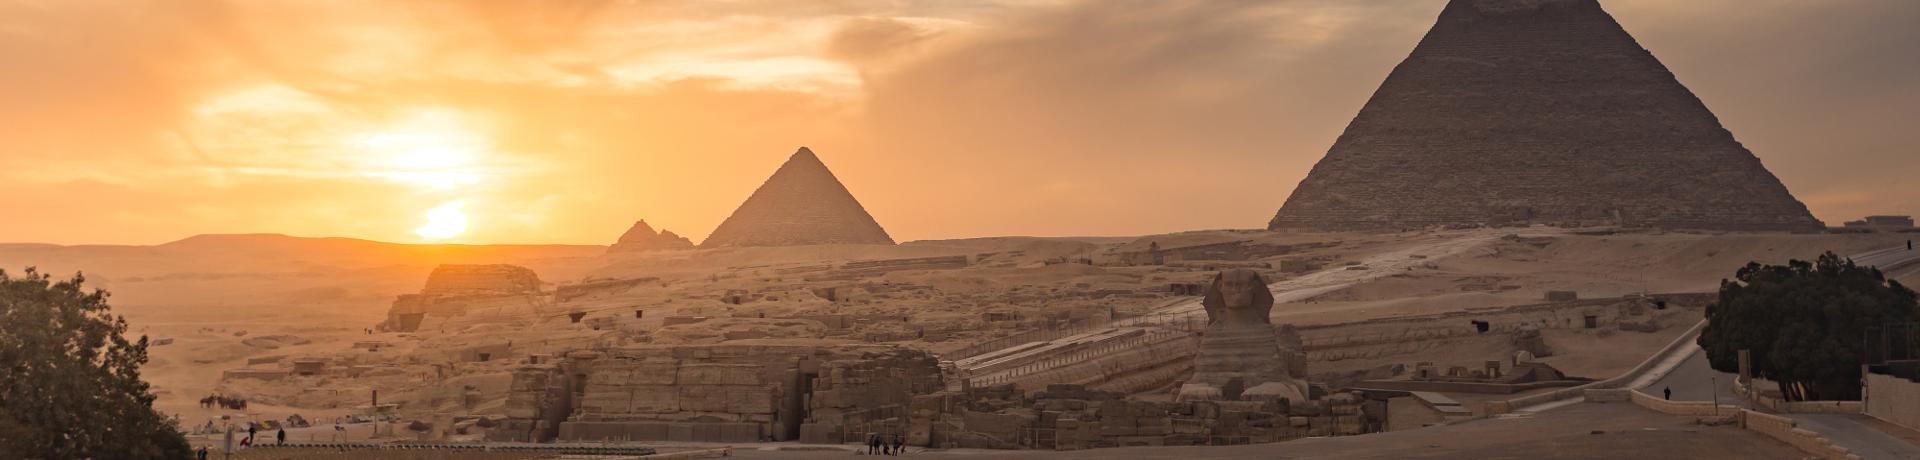 Ägypten: Sphinx - Pyramiden - panorama (png)